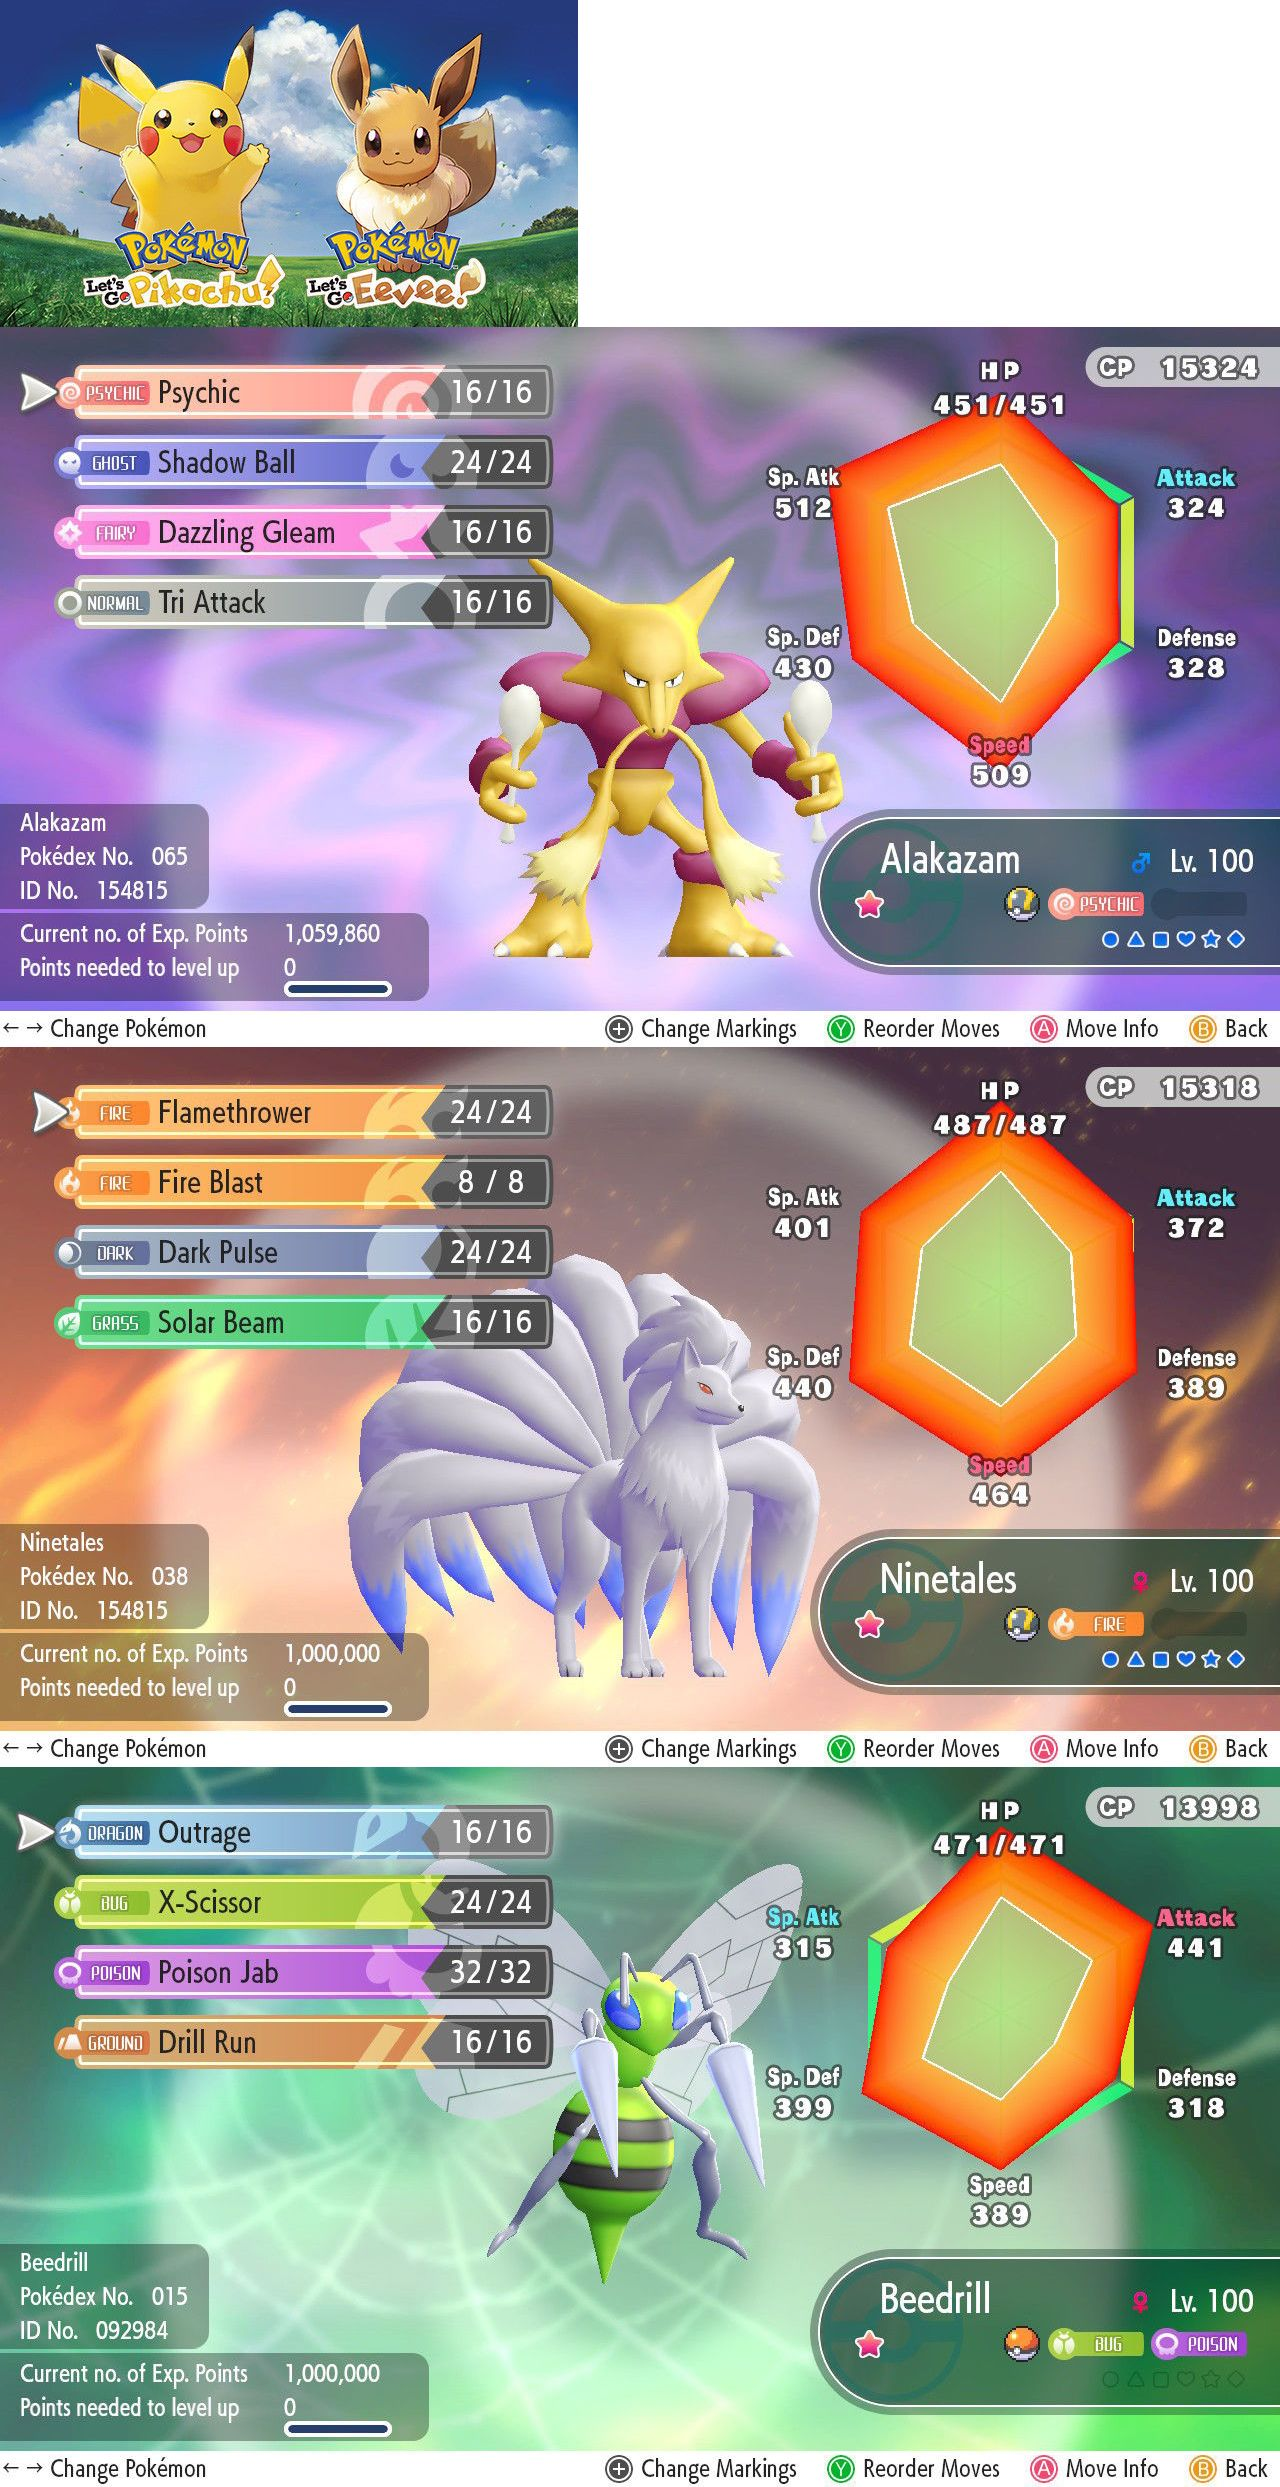 Strategy Guides and Cheats 156595: Pokemon Let S Go Max 6Iv Av 6